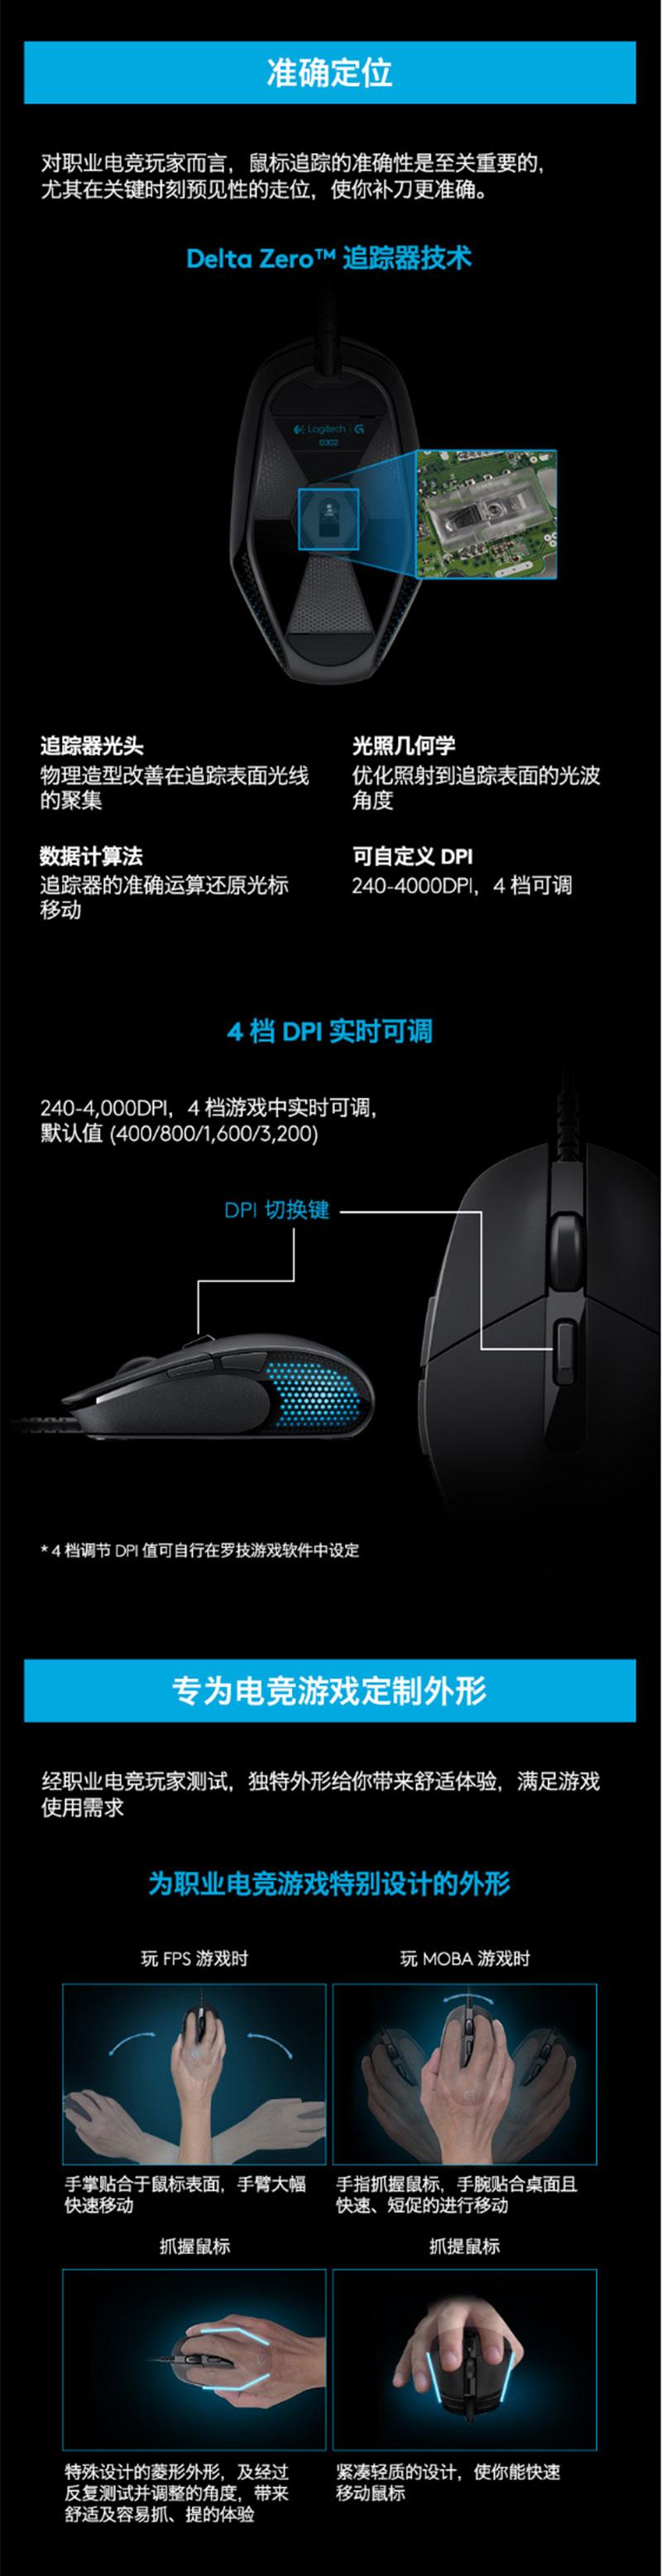 G302 MOBA电竞游戏鼠标